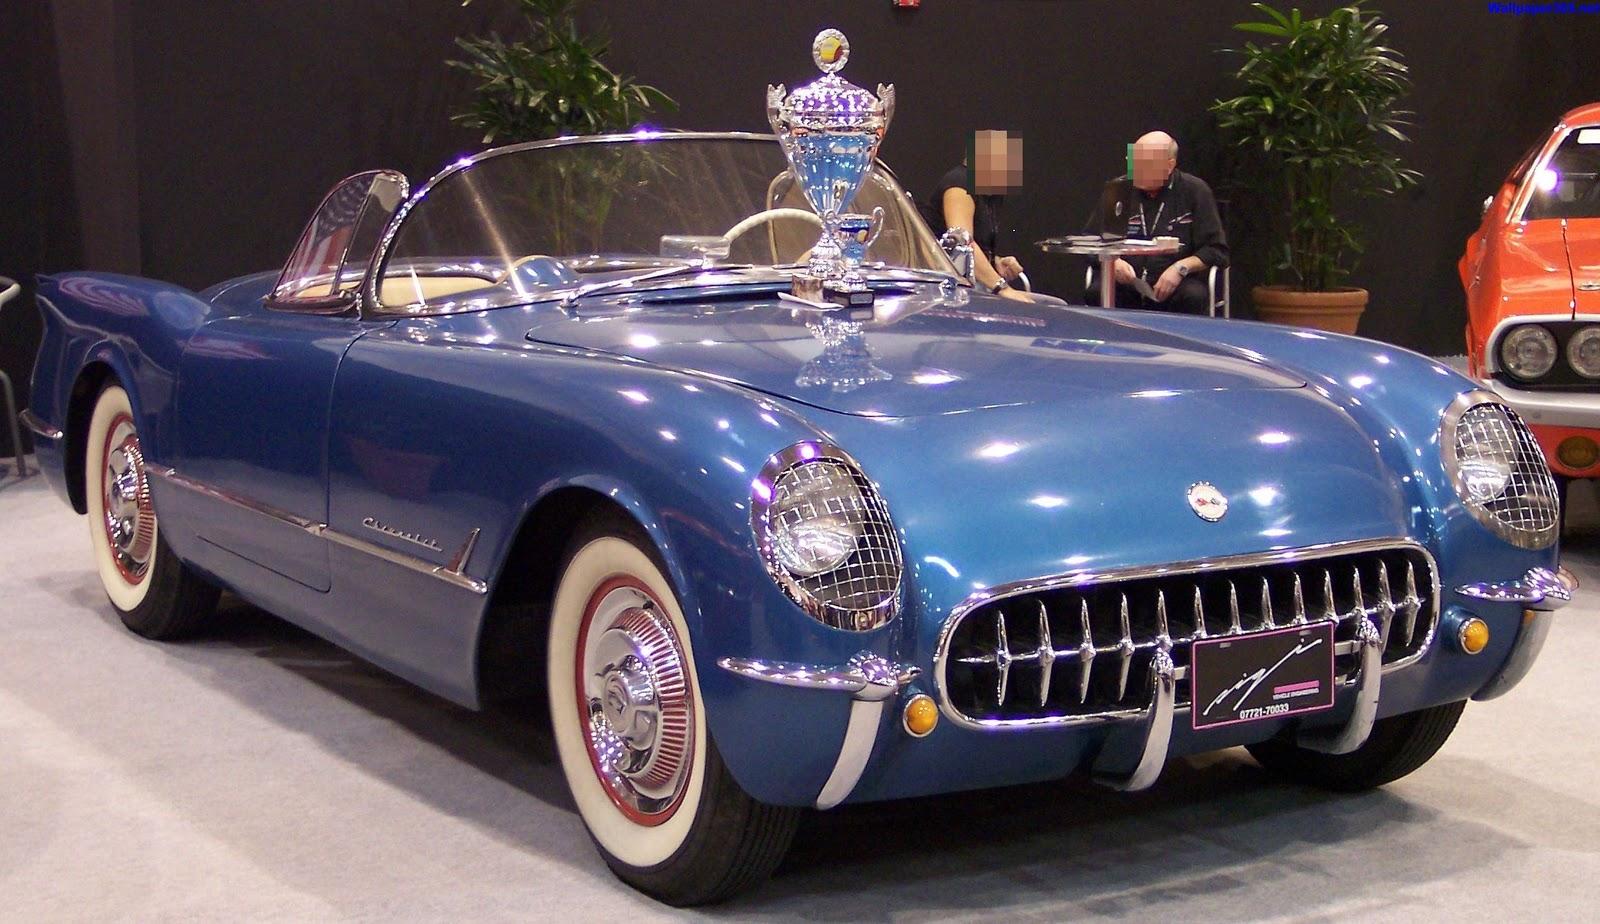 http://1.bp.blogspot.com/-ZSCPaETed8A/TpzaDkFHngI/AAAAAAAAAec/9GO2yHRC0m4/s1600/Chevrolet+Corvette+%25287%2529.jpg